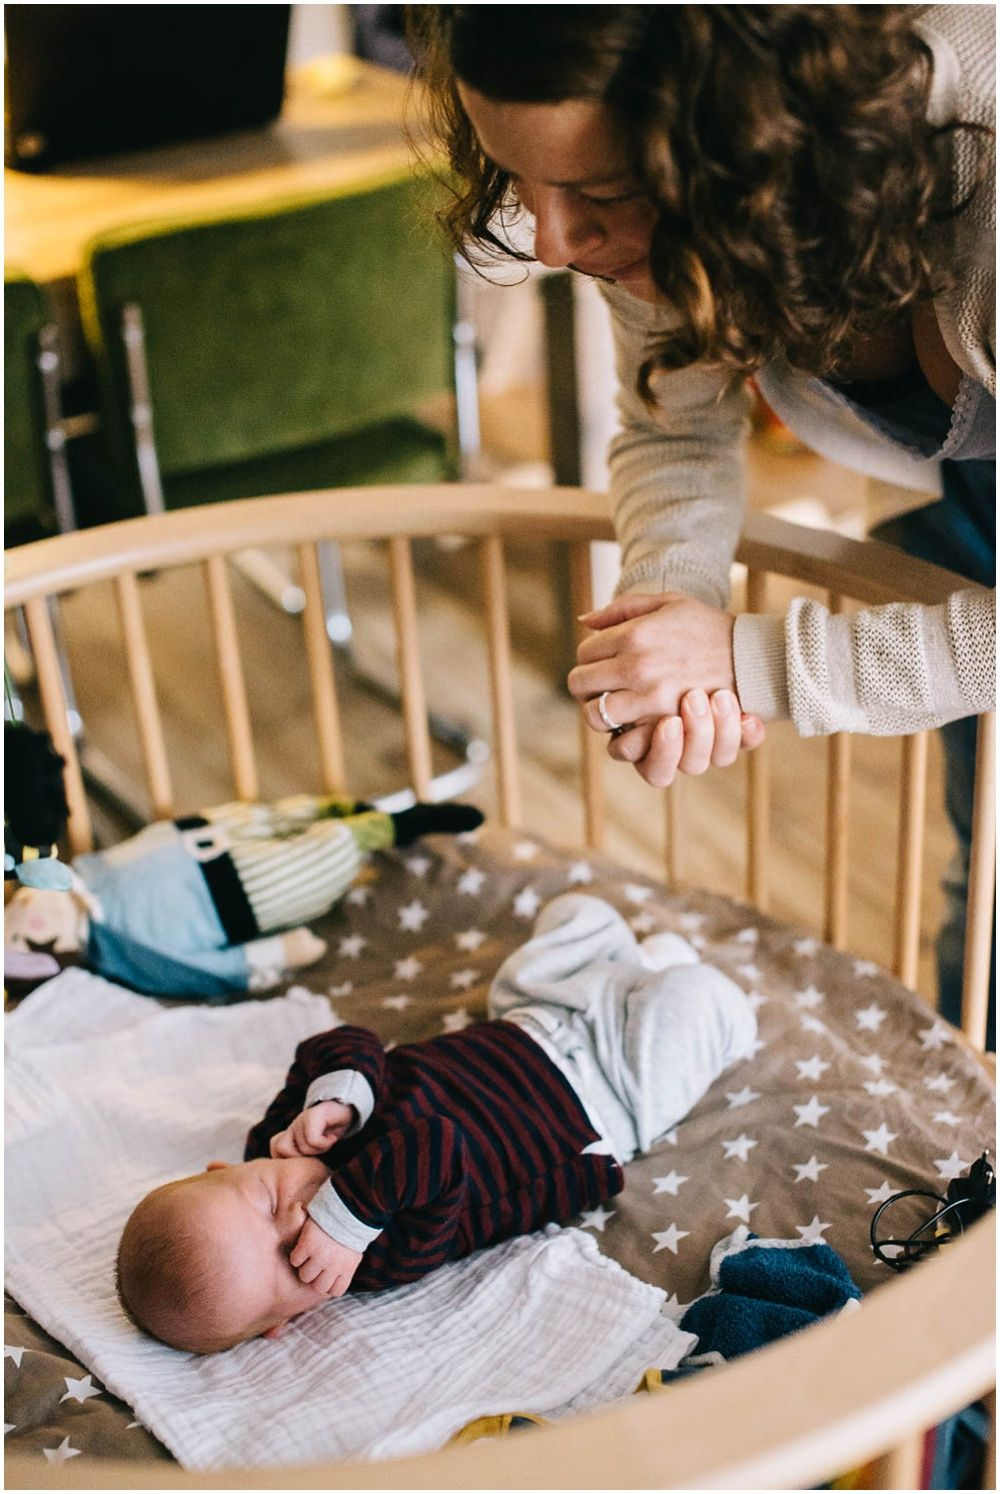 Lifestyle newborn fotografie aan huis Boxtel 003.jpg